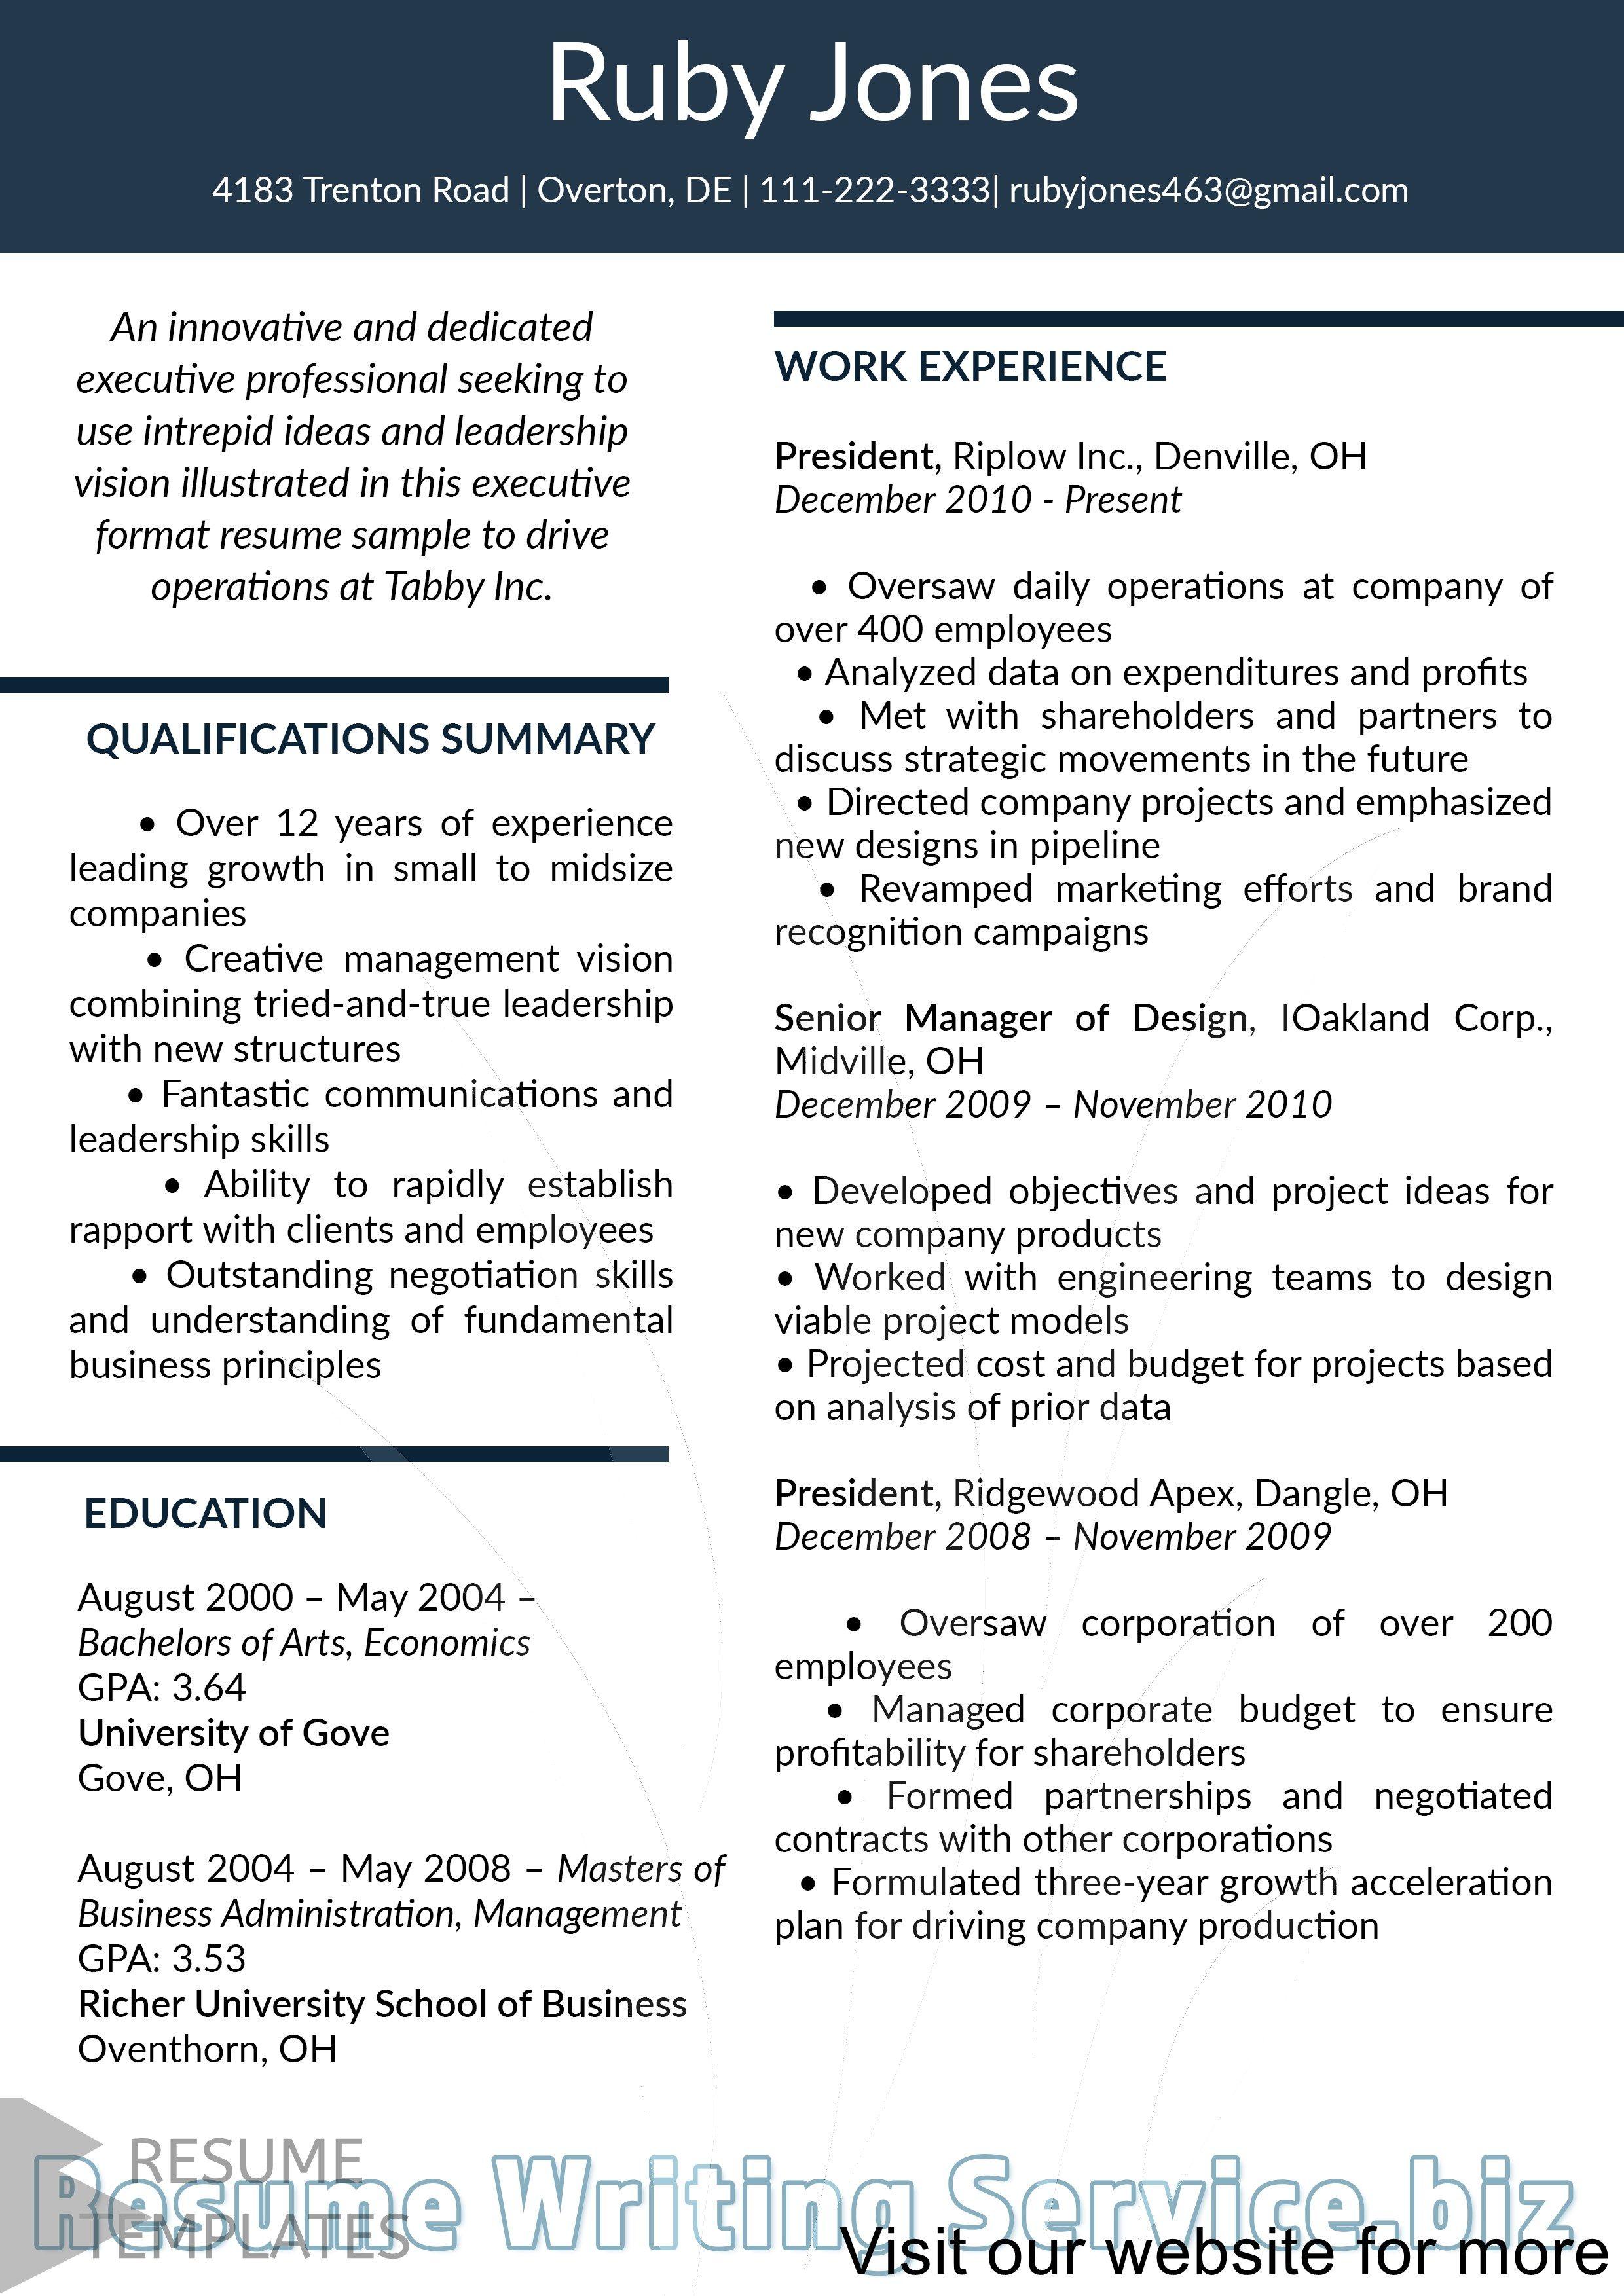 Non Chronological Chronological resume template, Resume